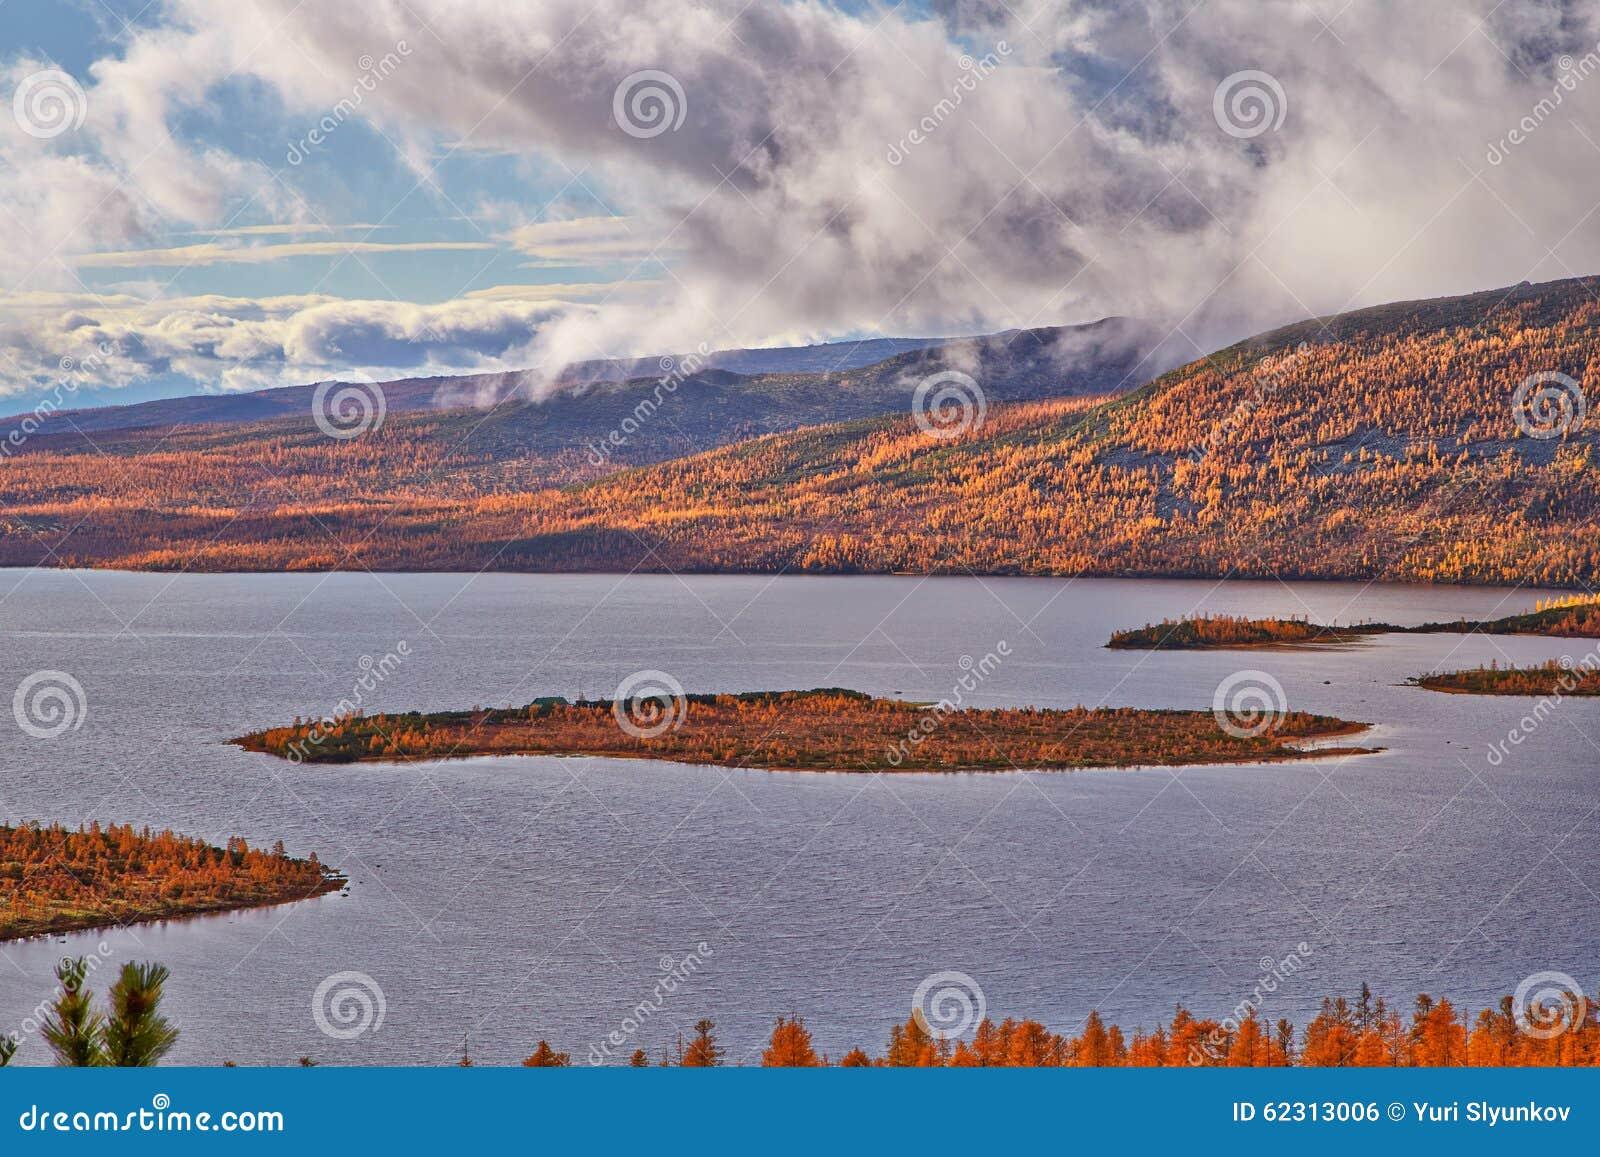 Autumn. After a rain. Jack London s lake